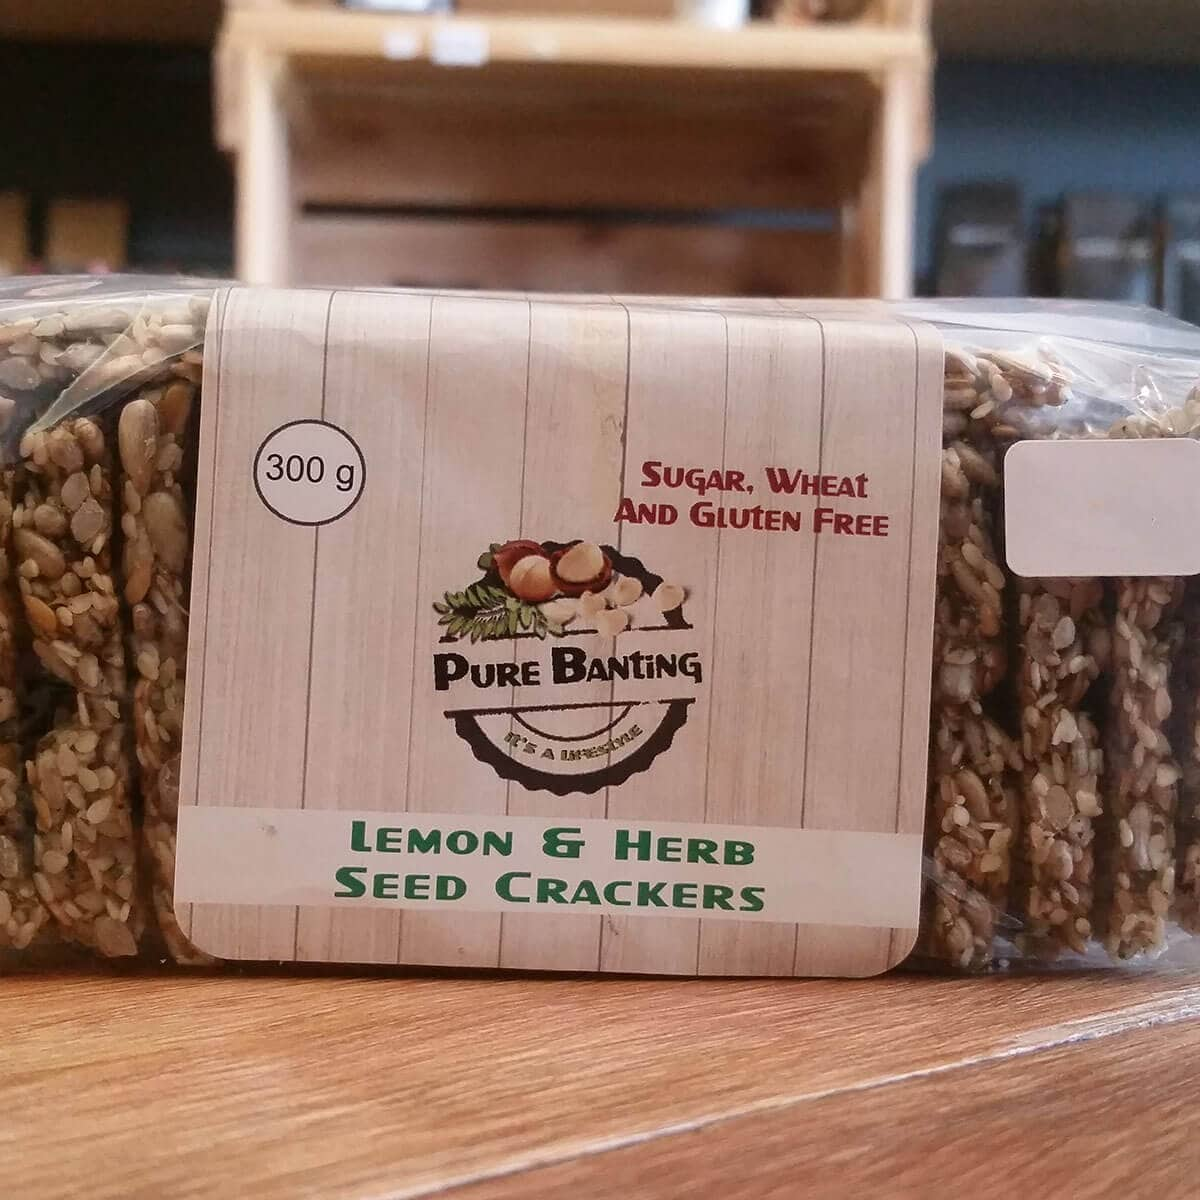 Pure Banting Lemon & Herb Seed Crackers (300g)